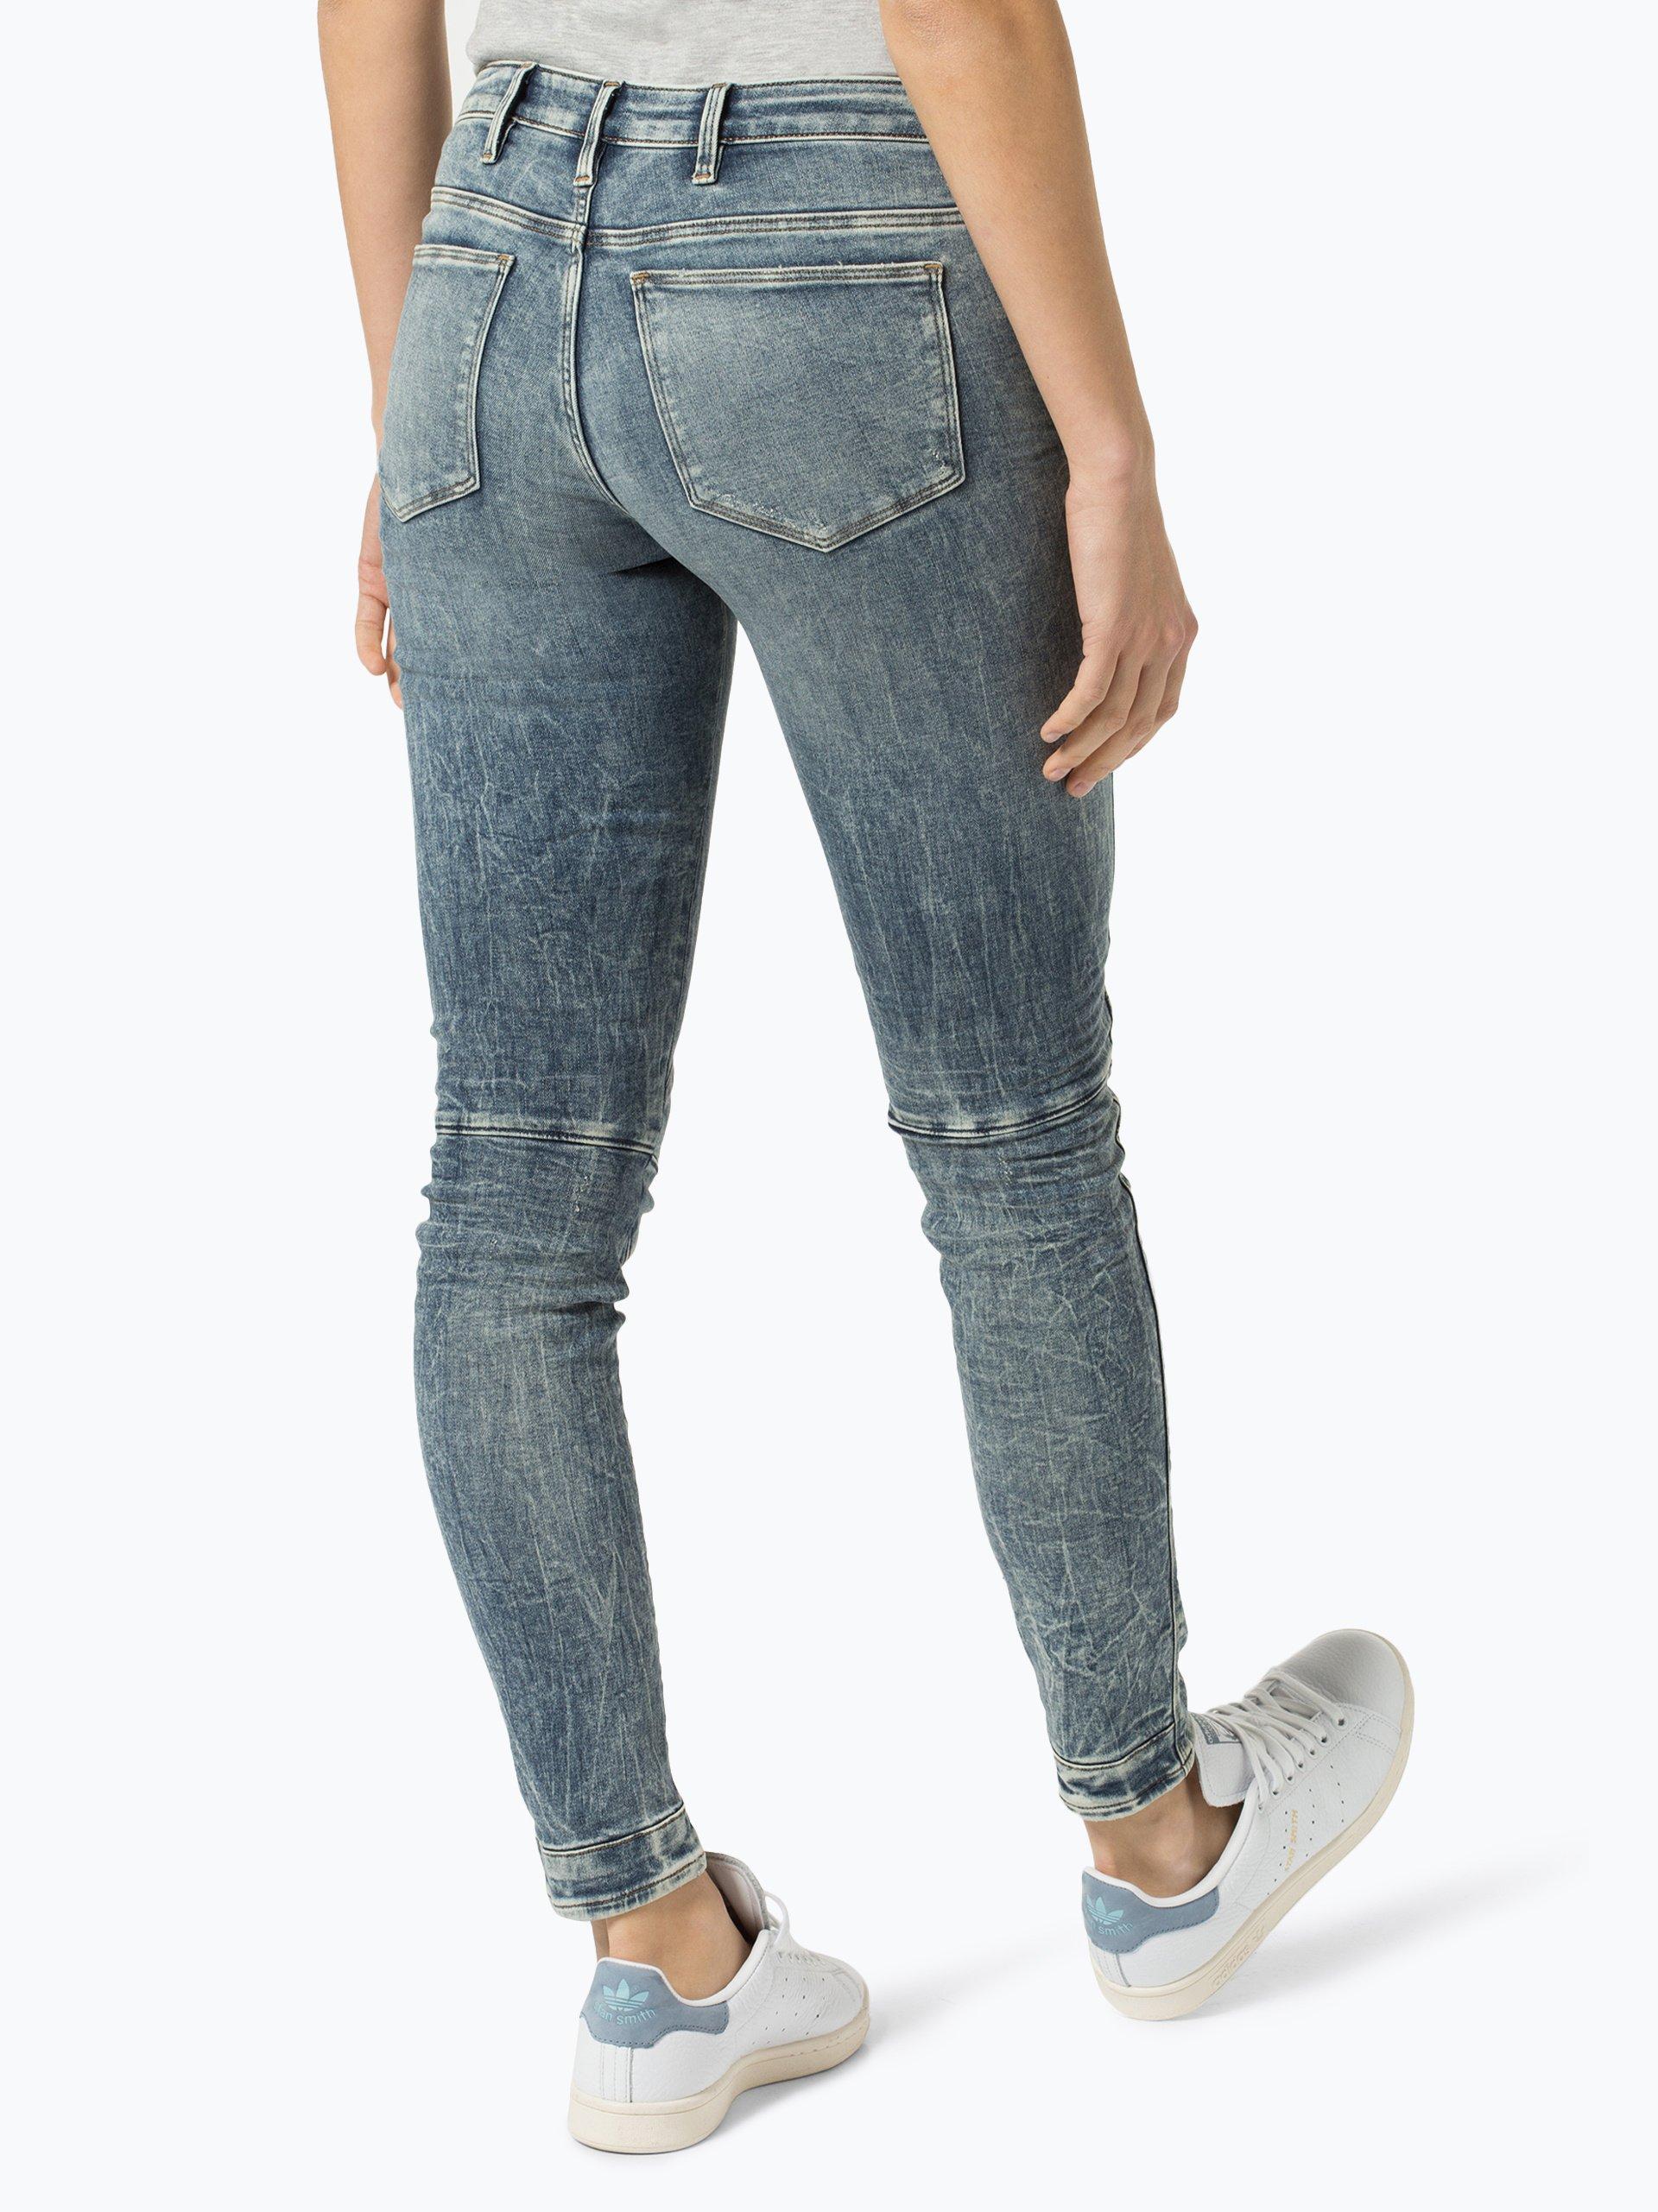 g star damen jeans elwood blau hellblau uni online. Black Bedroom Furniture Sets. Home Design Ideas